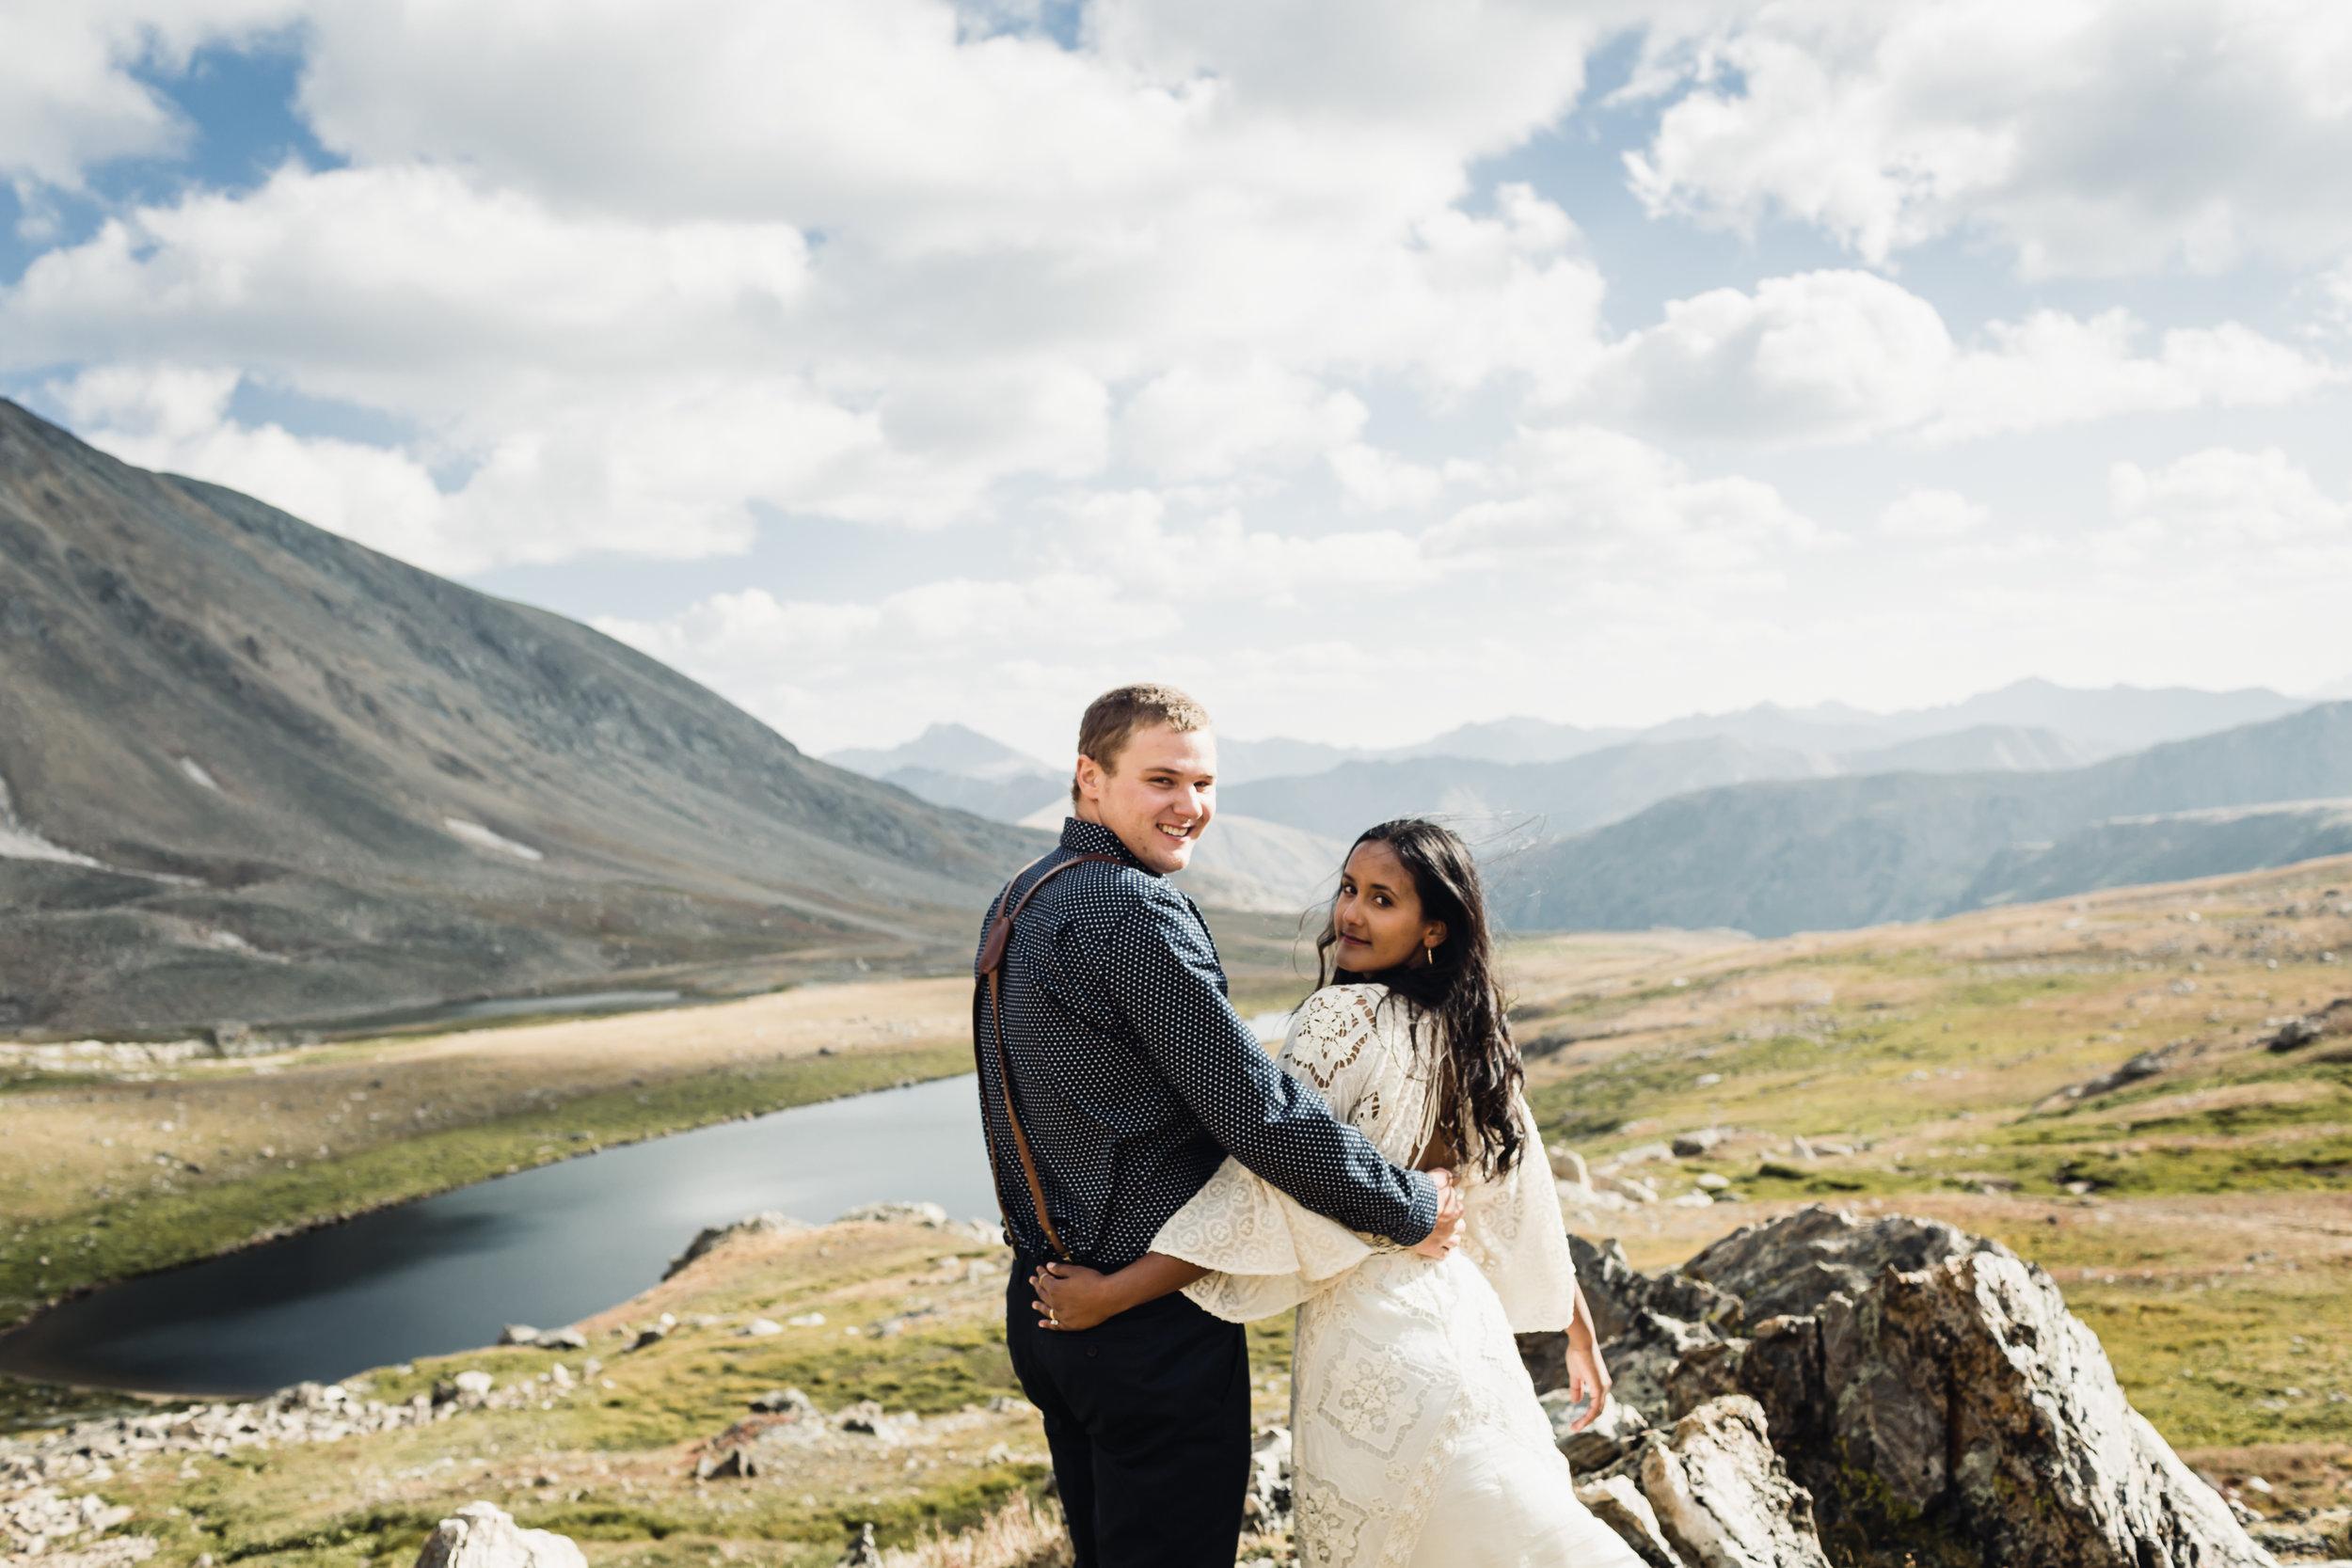 Gianna Keiko Aspen Wedding Photographer-12.jpg